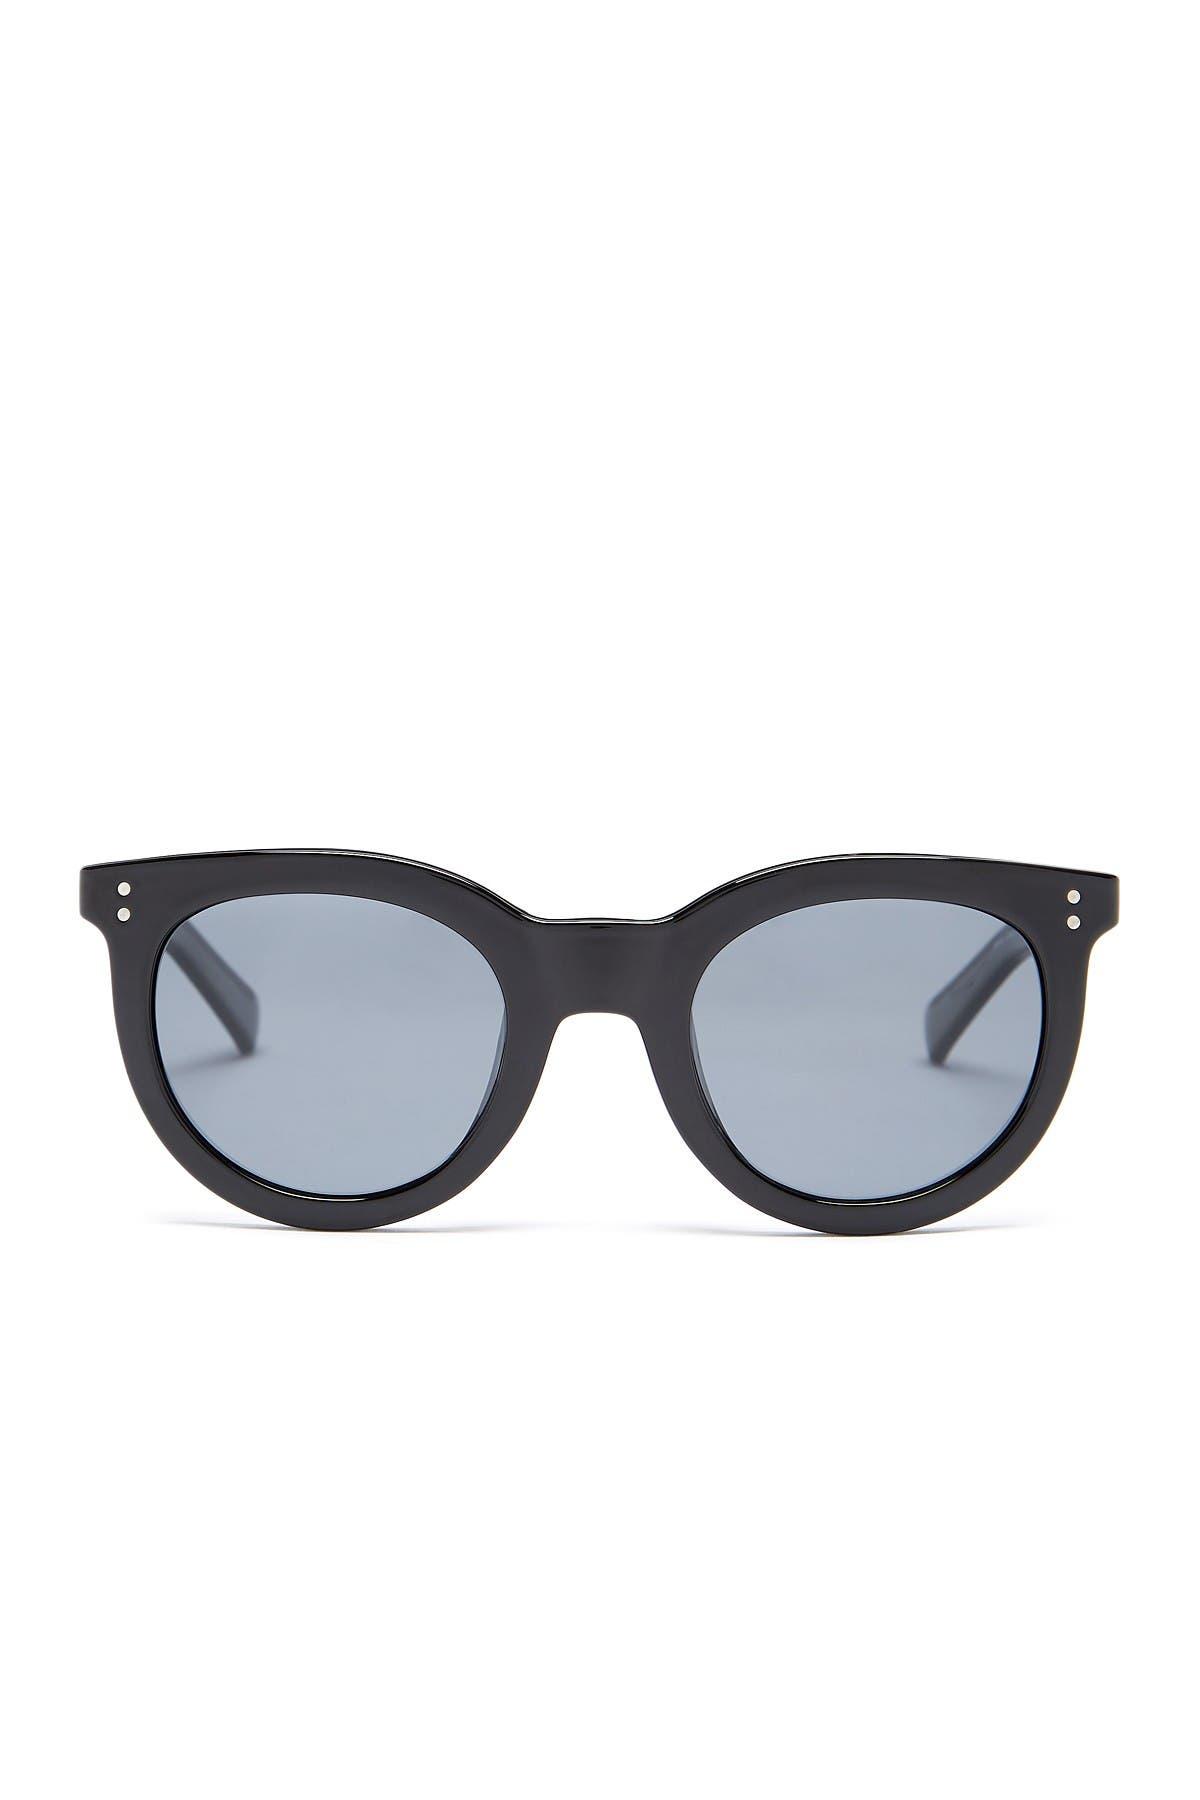 Image of Cole Haan Schoolboy Polarized 50mm Retro Sunglasses